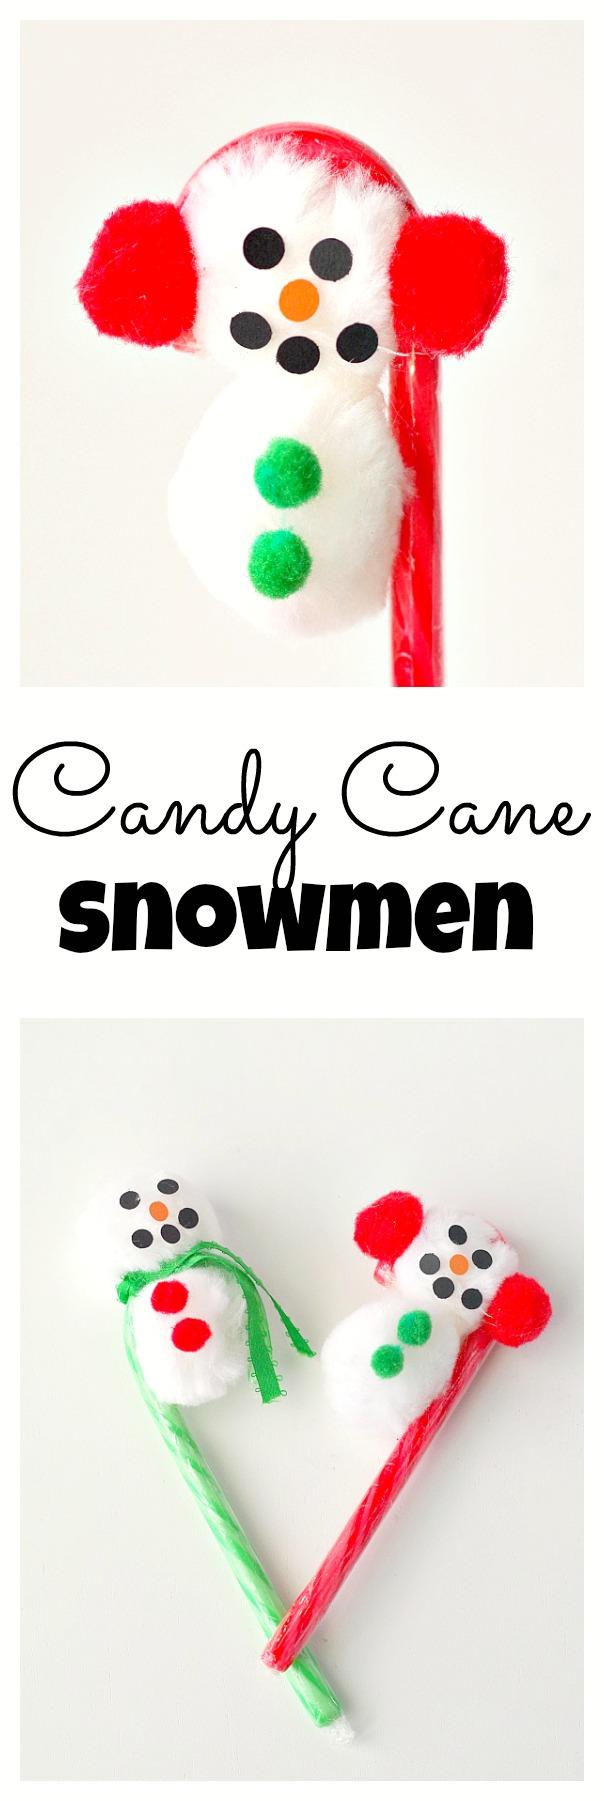 Candy Cane Snowmen